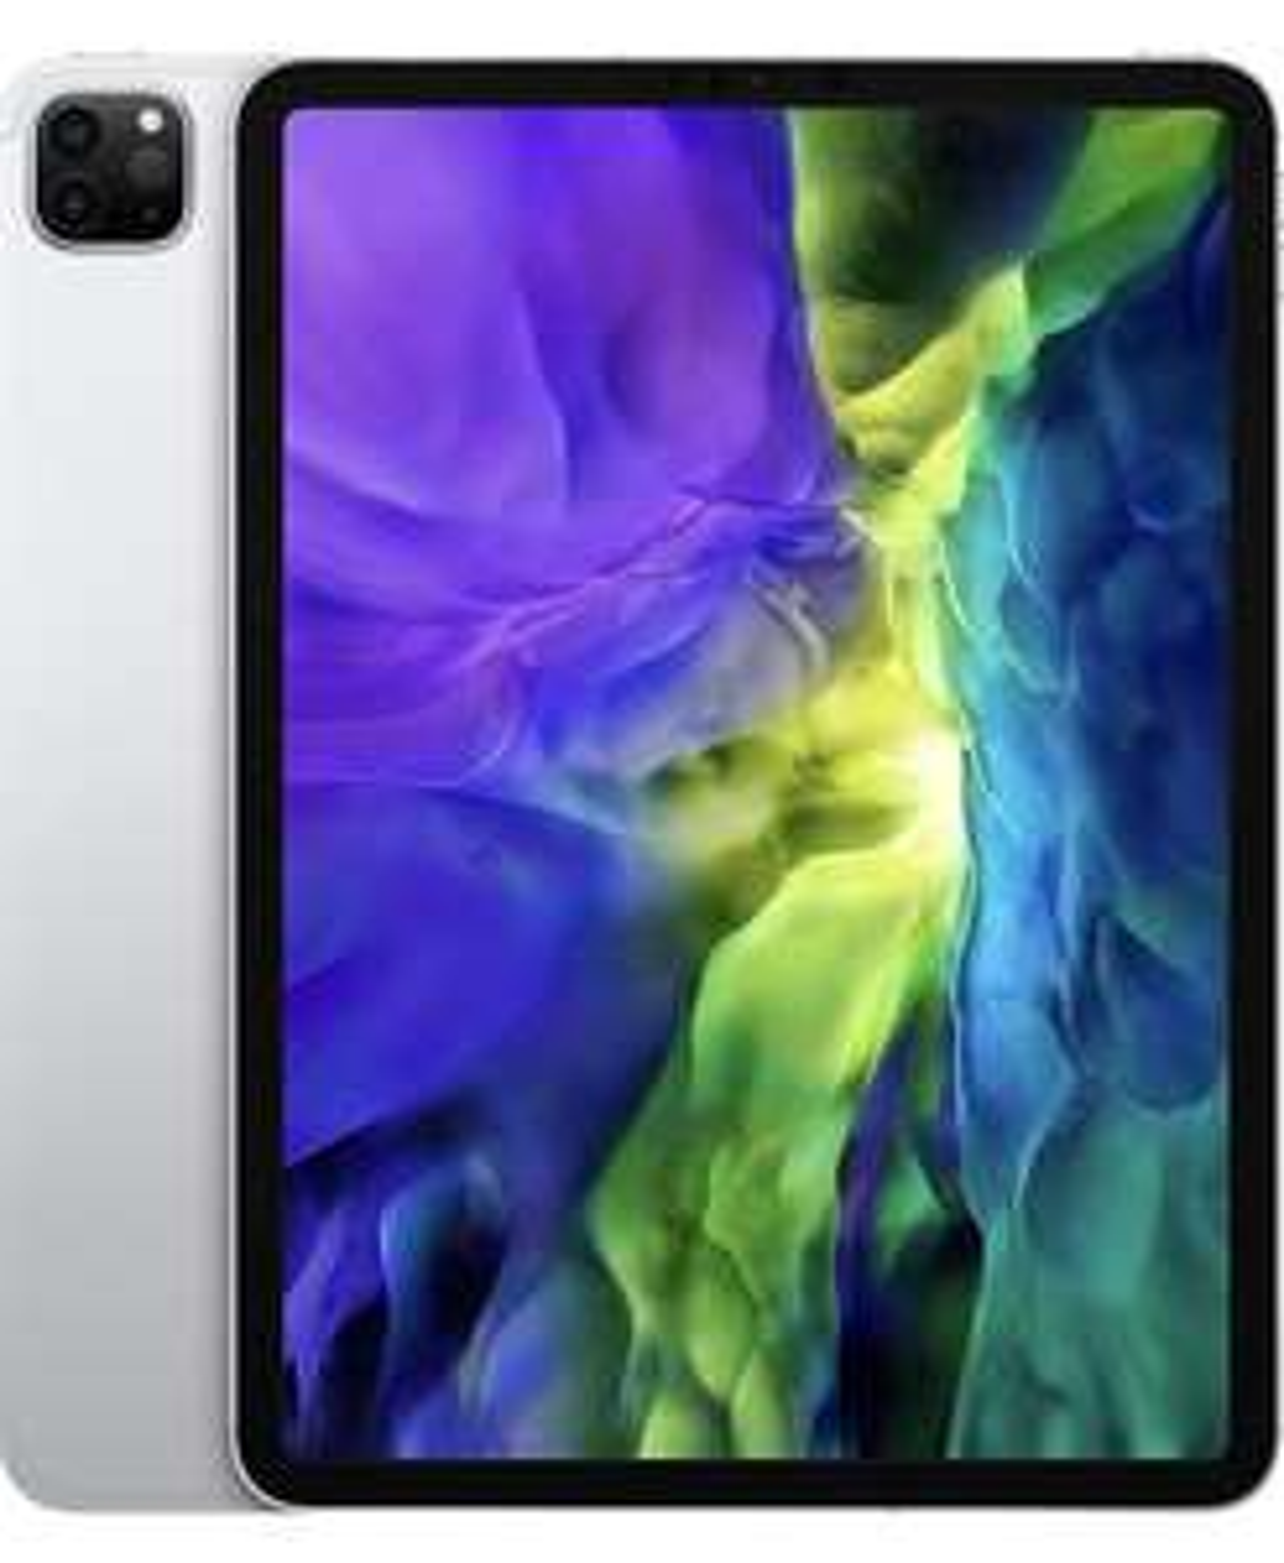 Apple iPad Pro 11 2020 Wi-Fi + Cellular 1 TB Silber